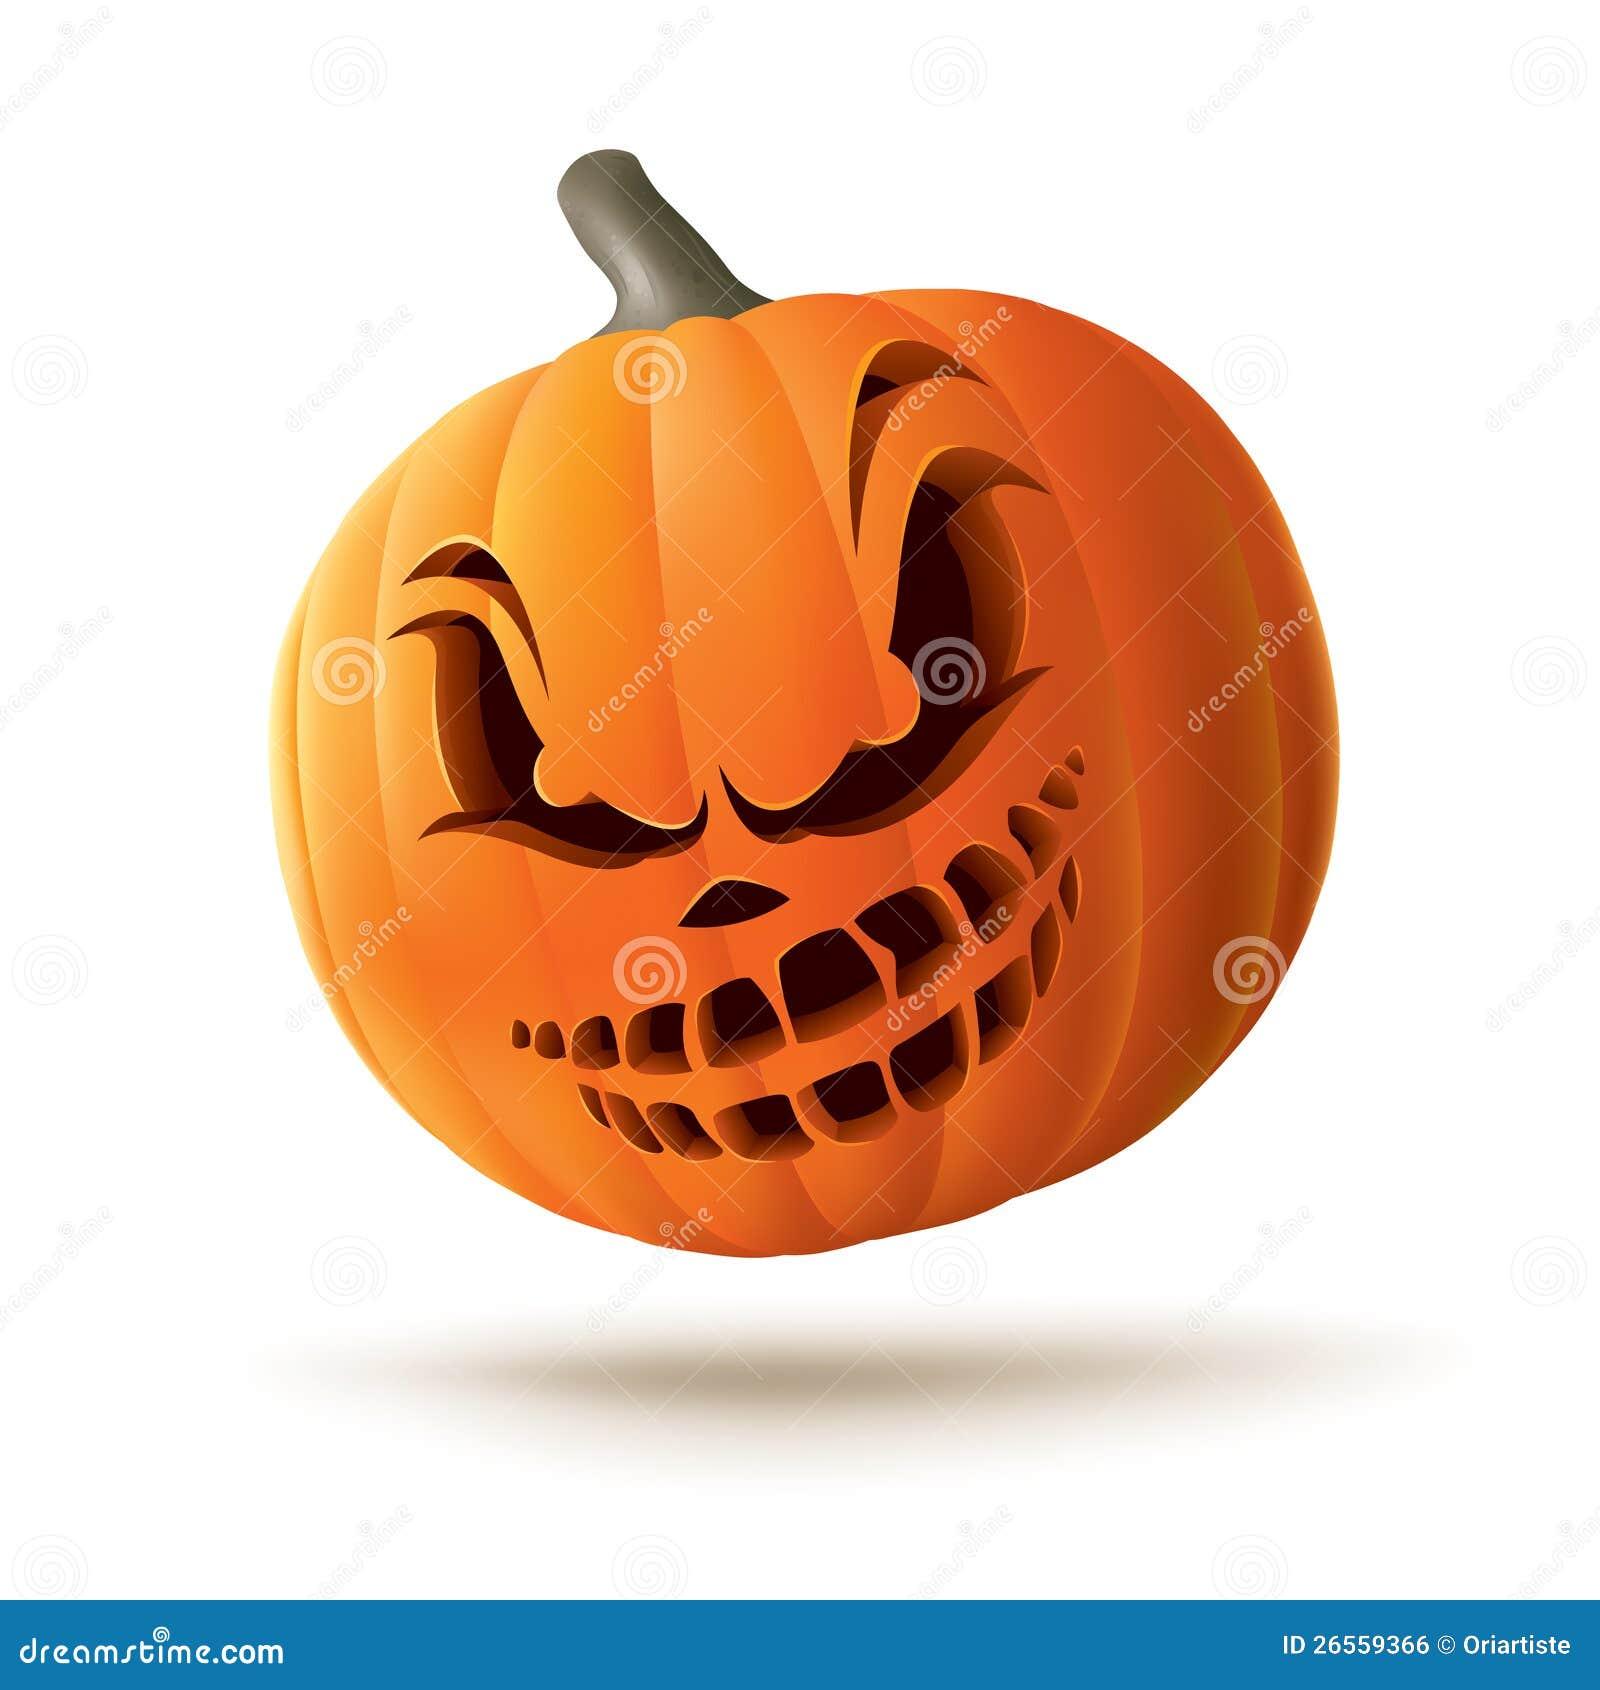 Scary Jack O Lantern Stock Vector Illustration Of White 26559366